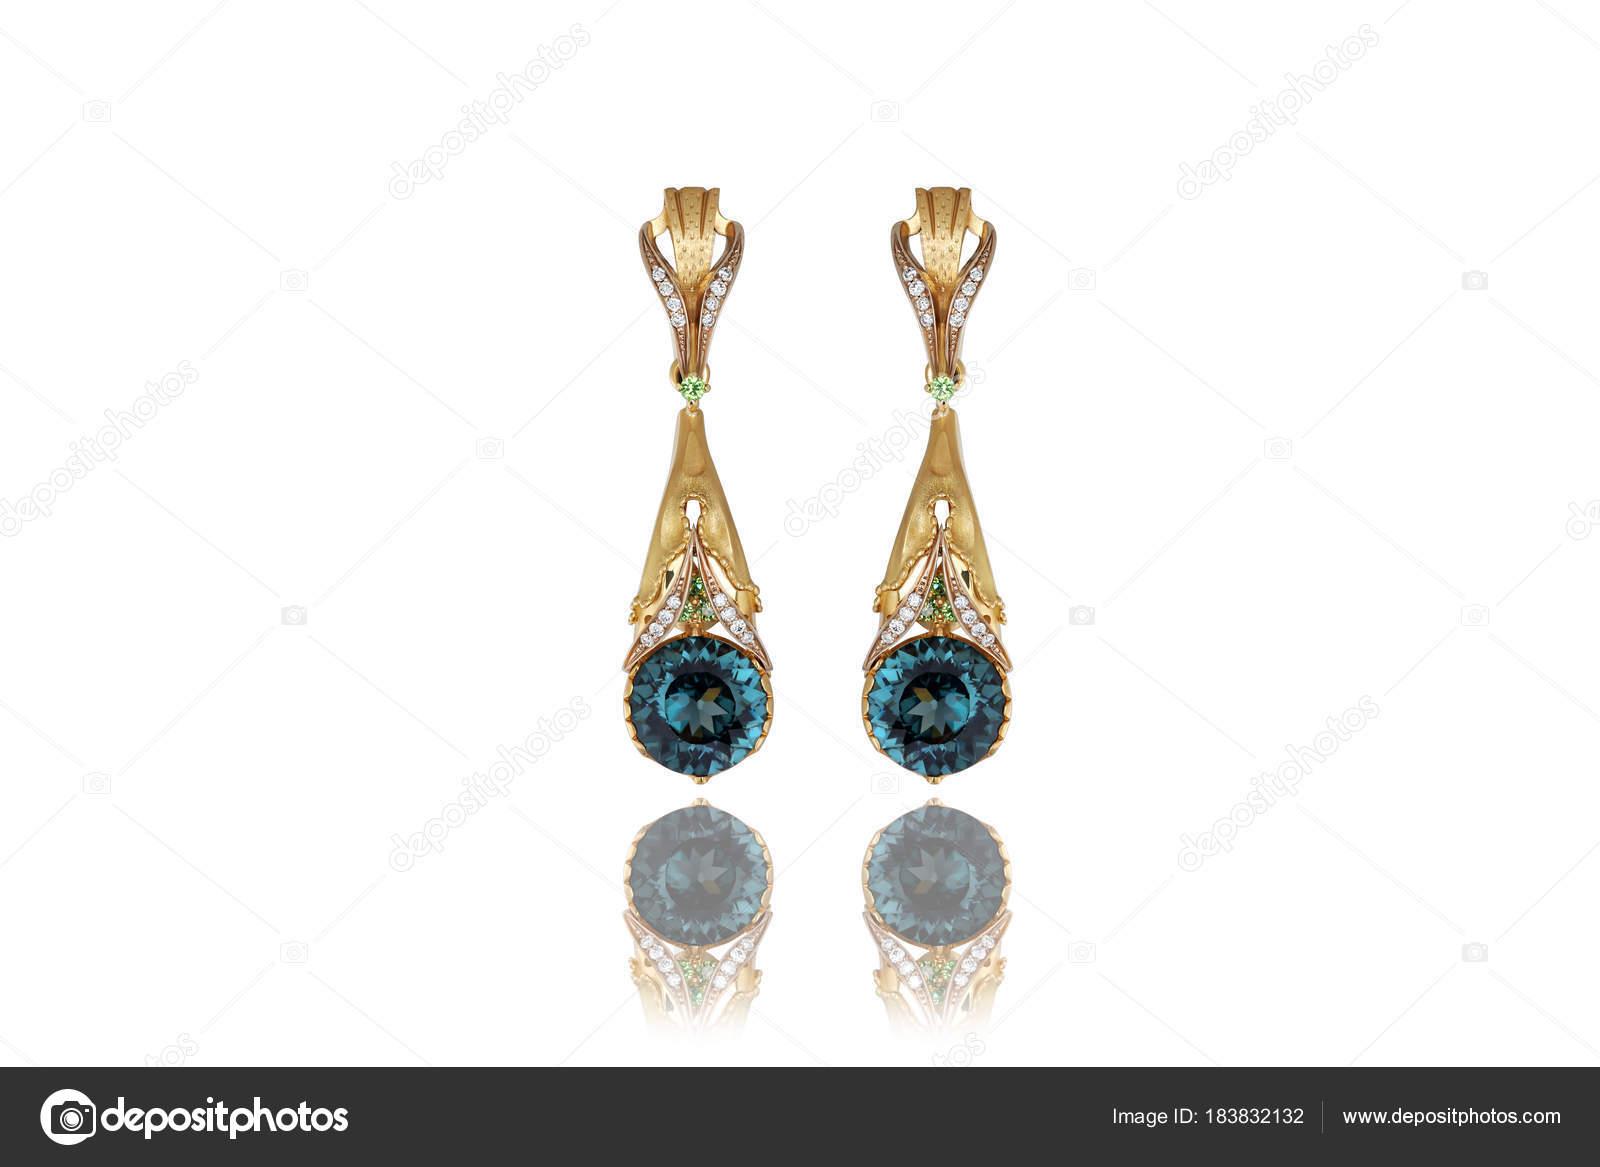 4c5004aa1858 Joyas Oro Plata Con Piedras Preciosas Sobre Fondo Blanco Alta — Foto de  Stock